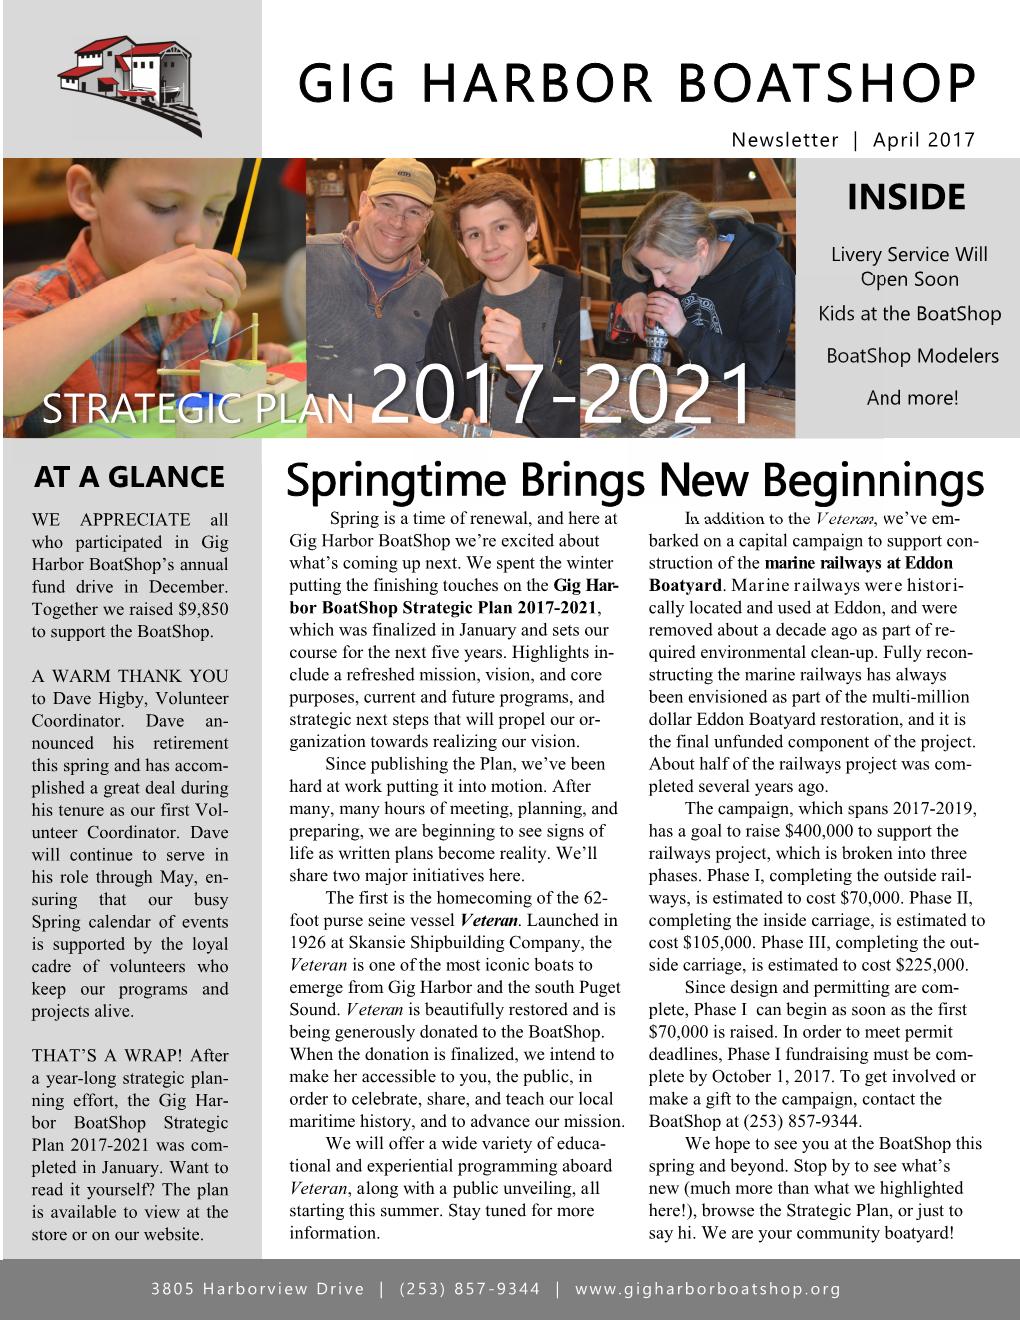 April 2017 Newsletter (click on image to enlarge)